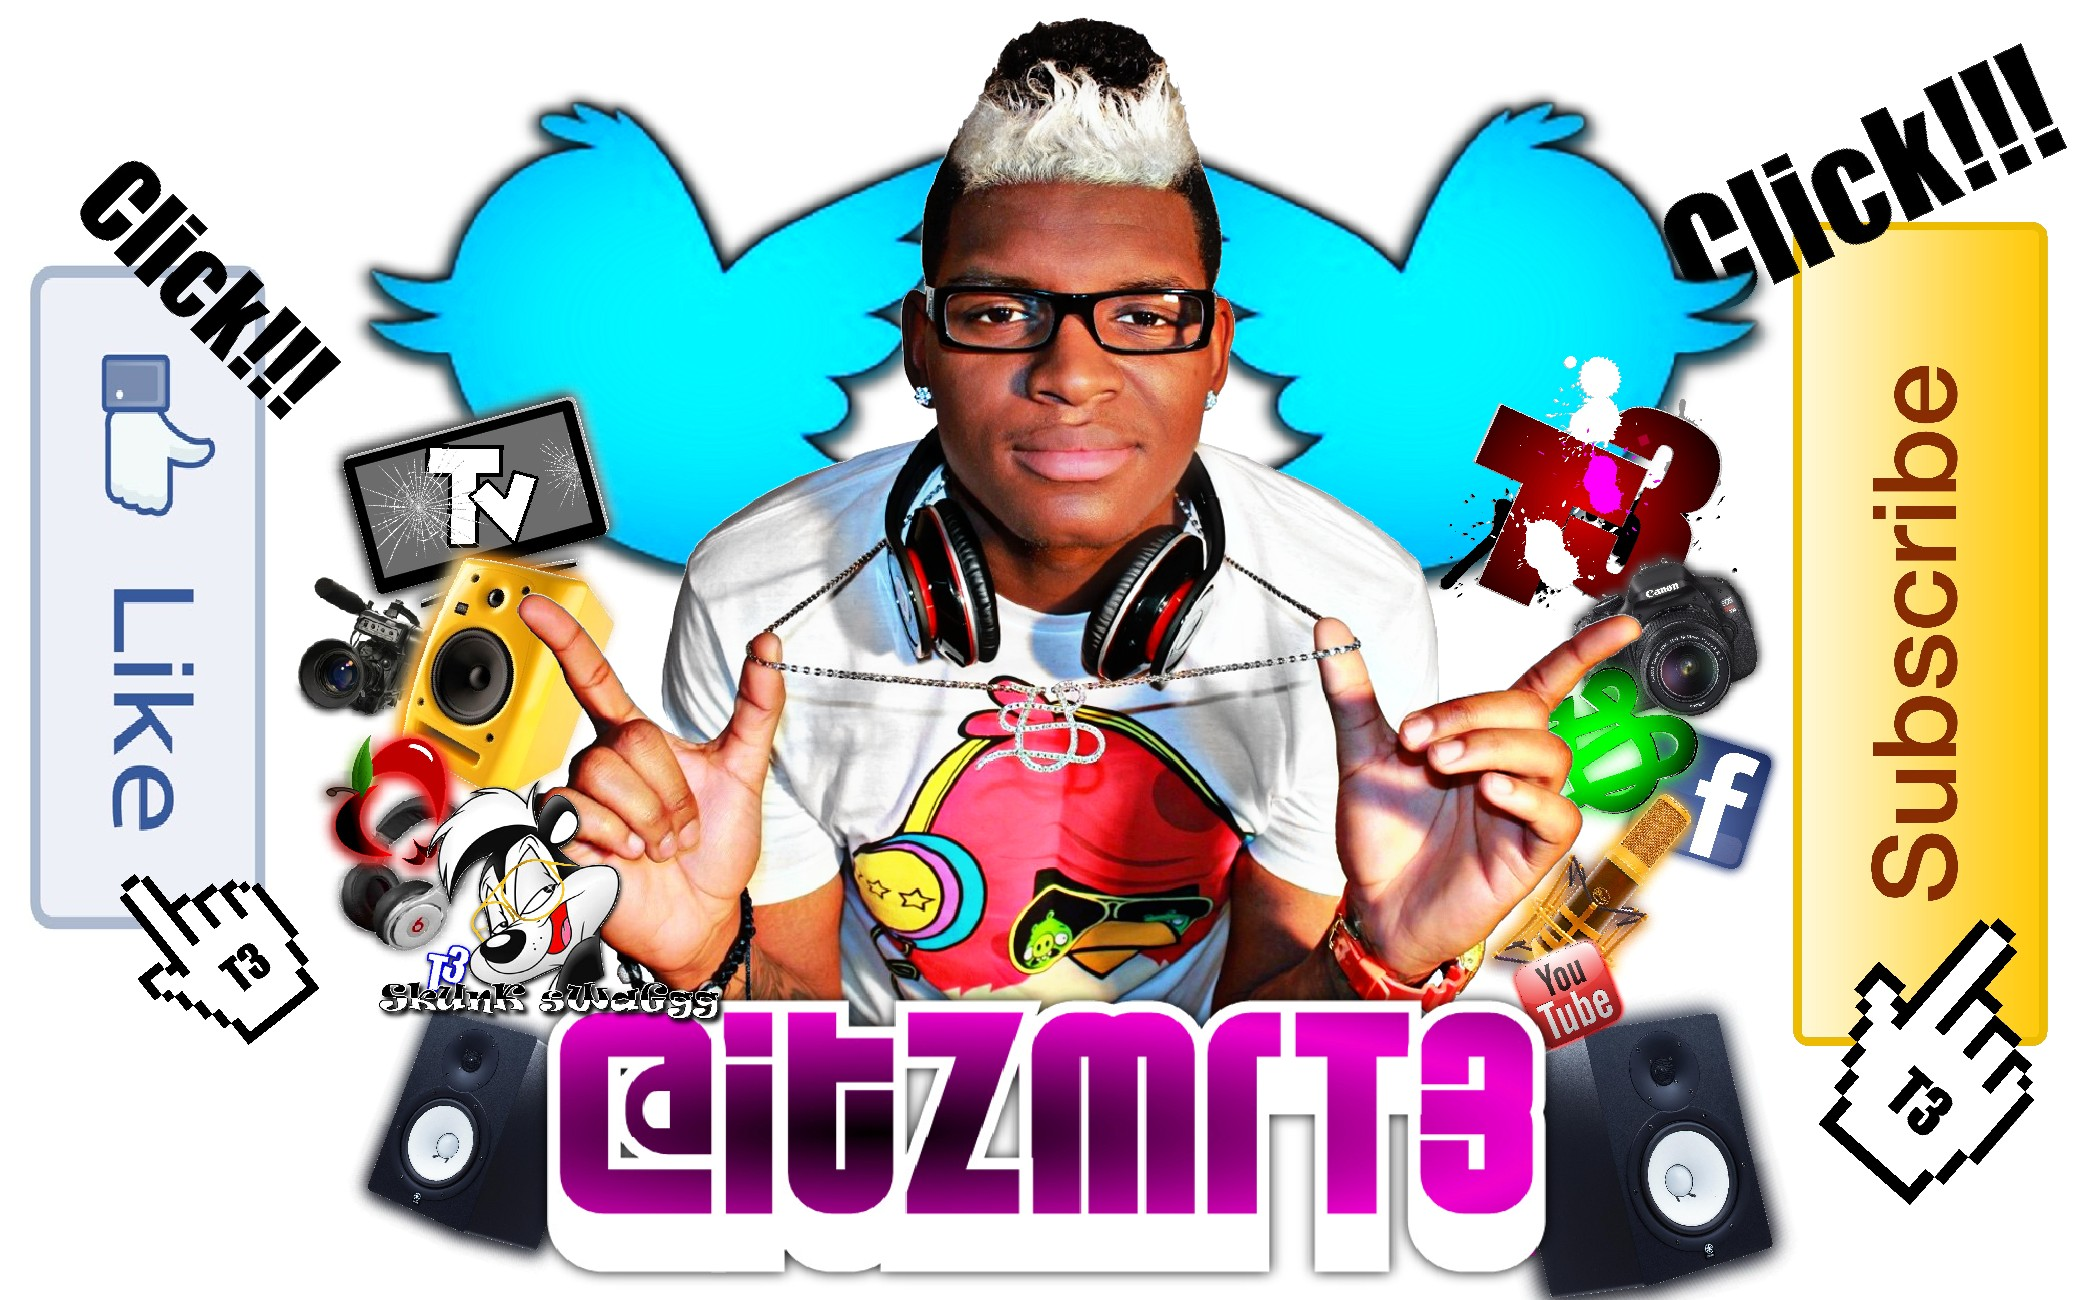 itzMrT3